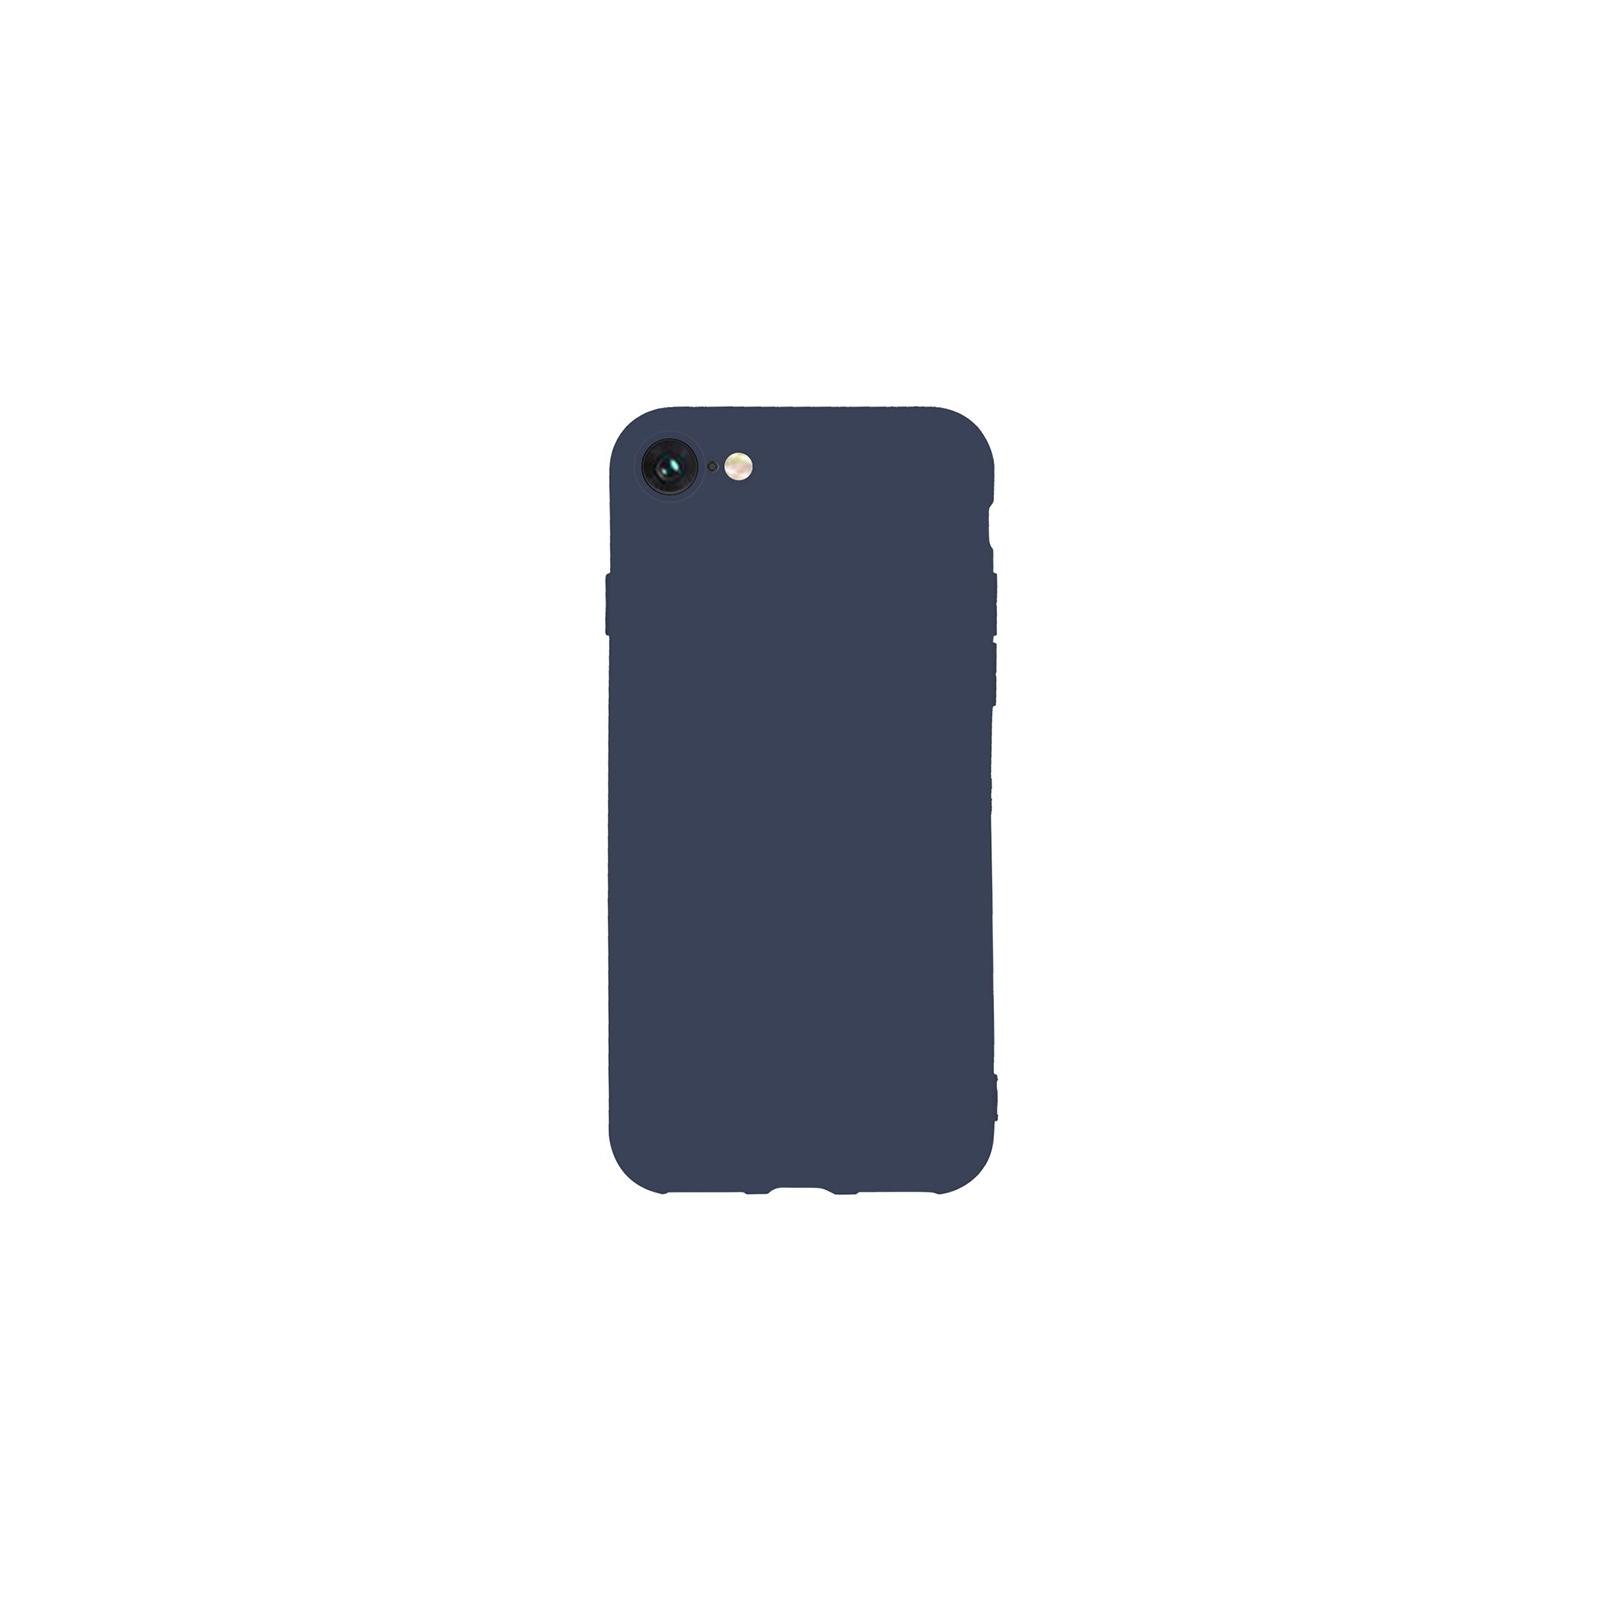 Чехол для моб. телефона Toto 1mm Matt TPU Case Apple iPhone 7/8 Navy Blue (F_101213)